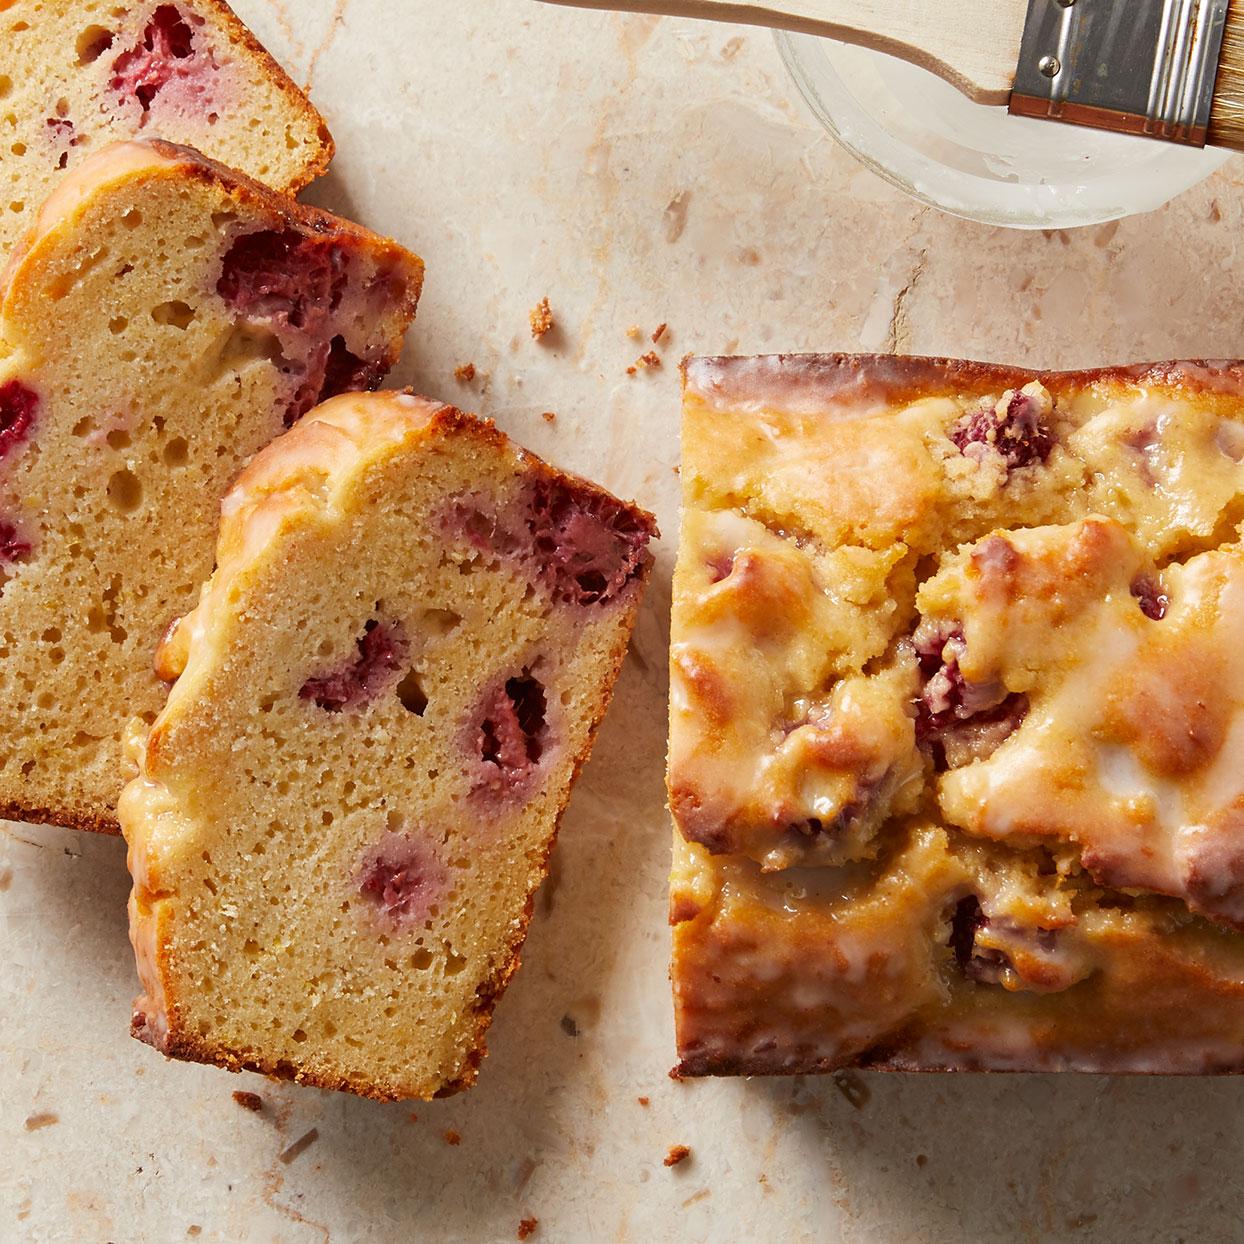 Lemon-Raspberry Ricotta Pound Cake